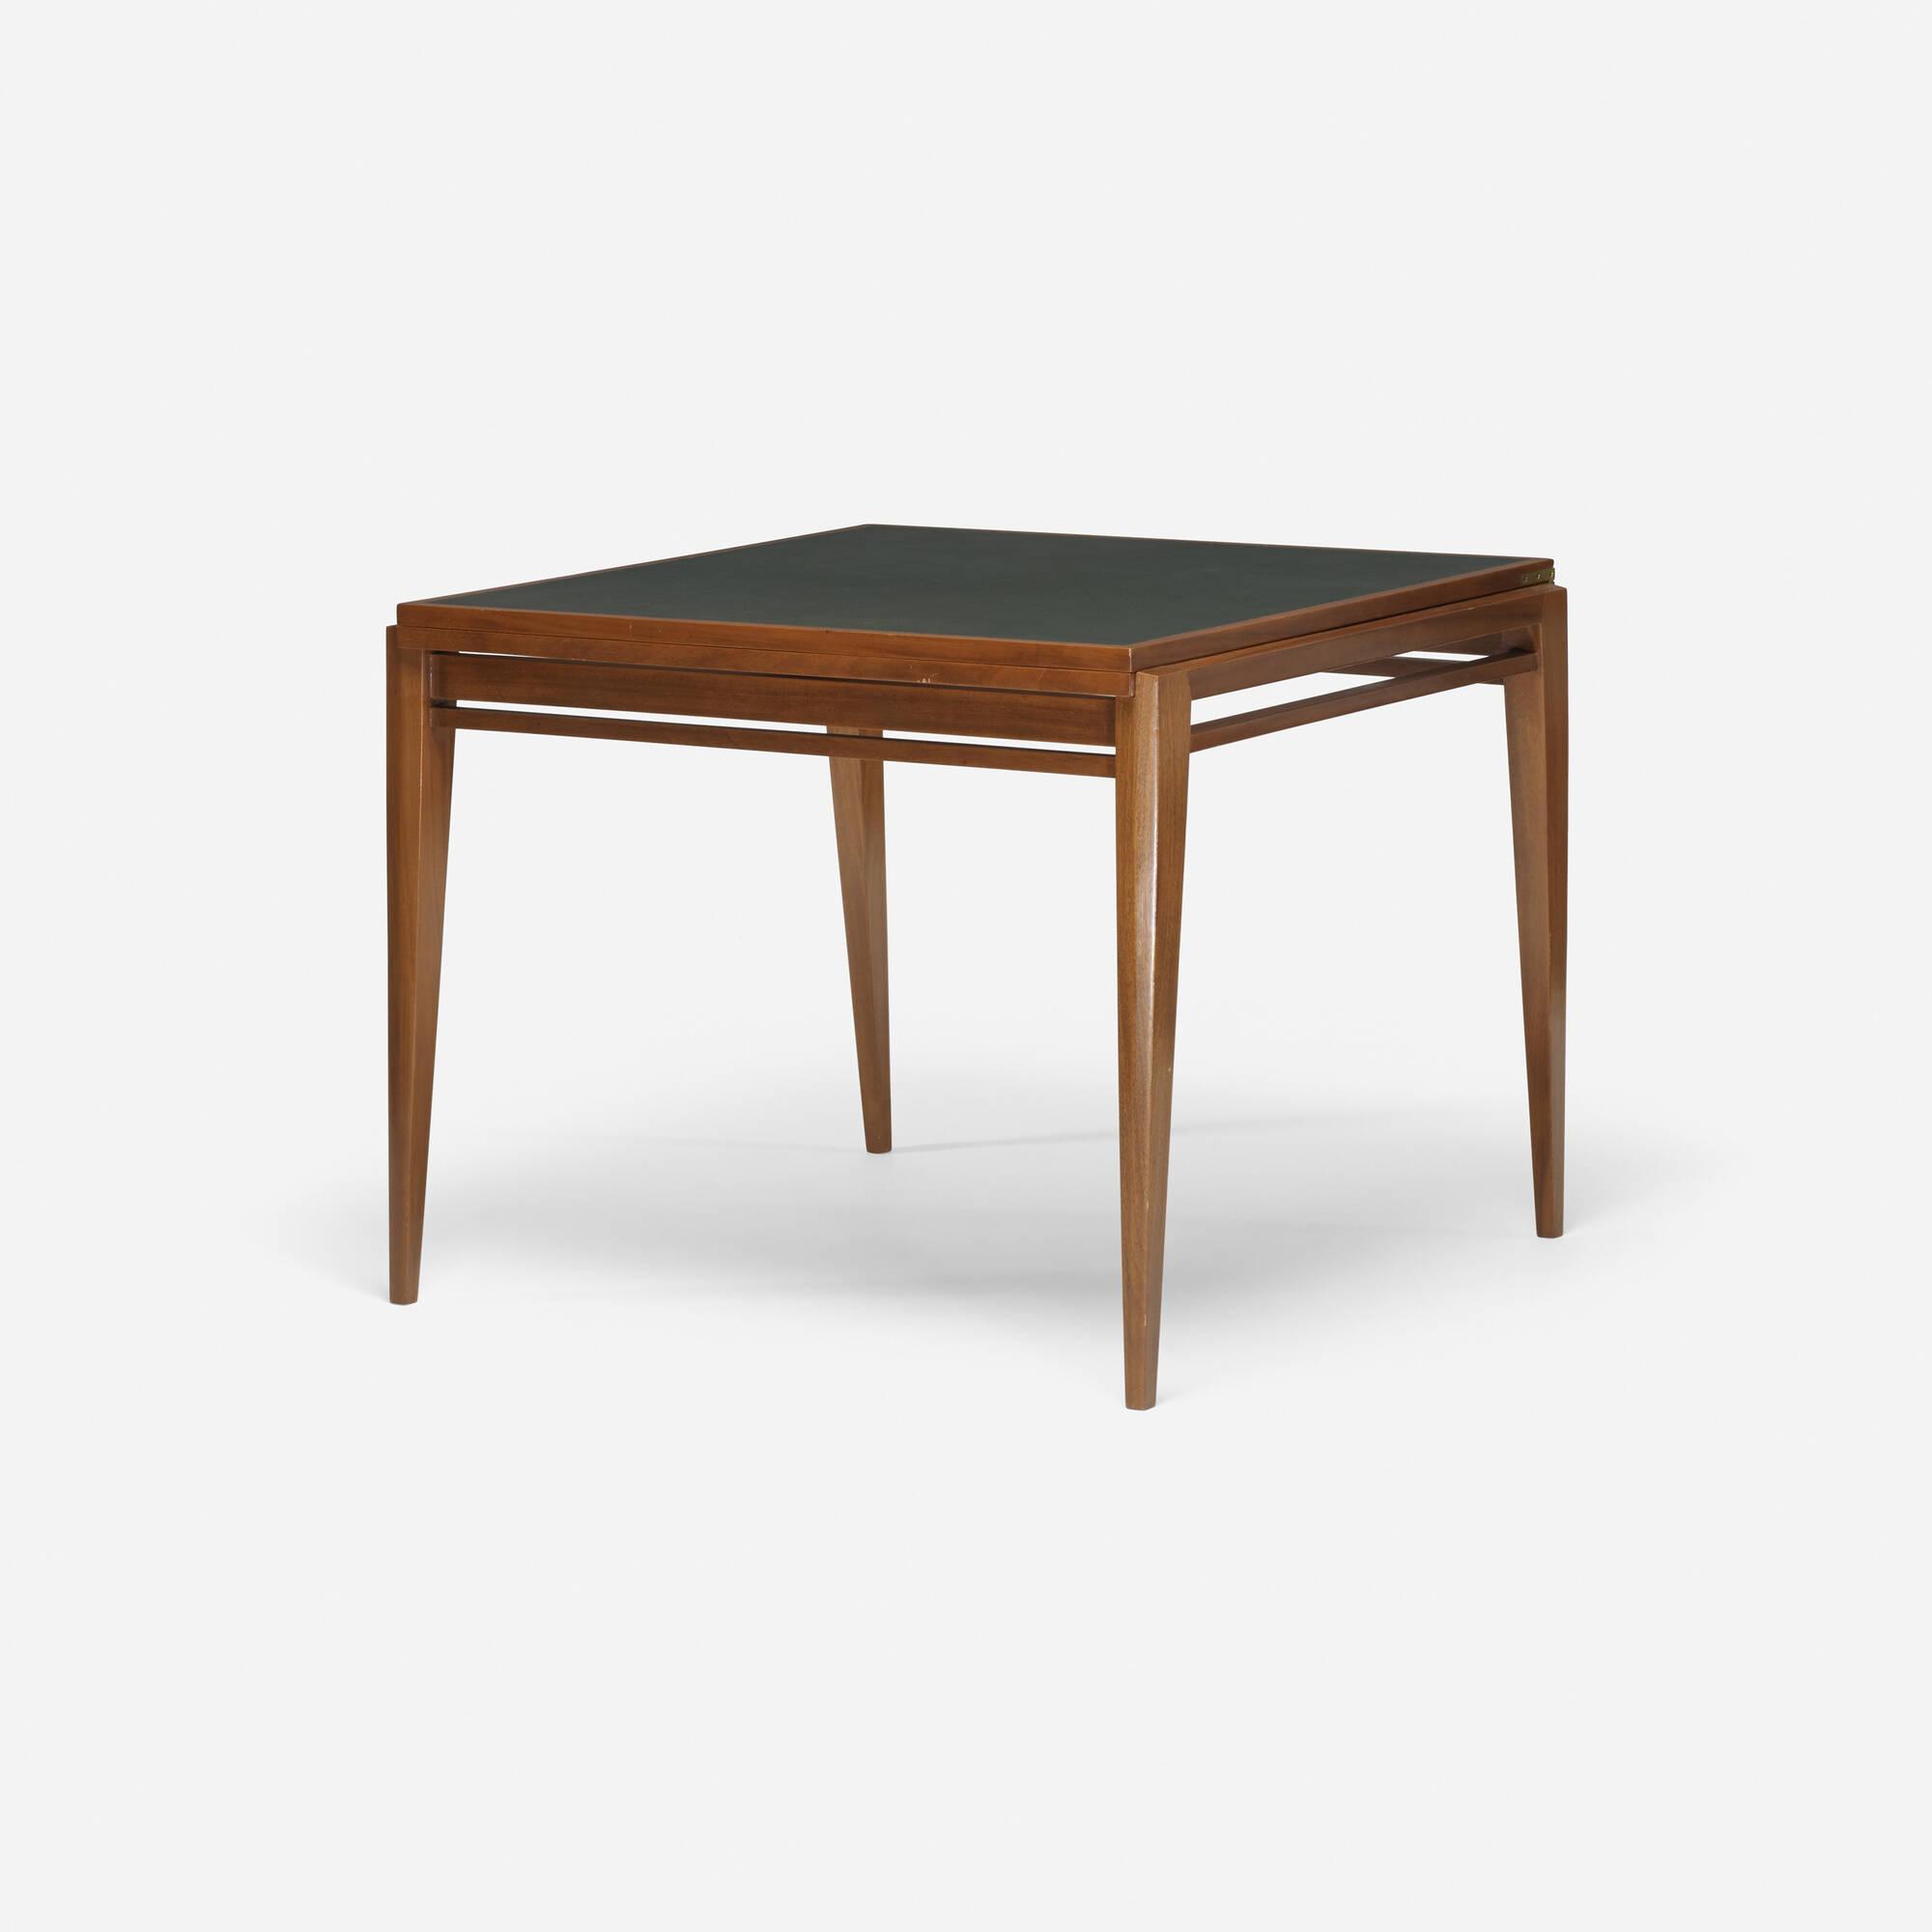 342 french flip top dining table. Black Bedroom Furniture Sets. Home Design Ideas